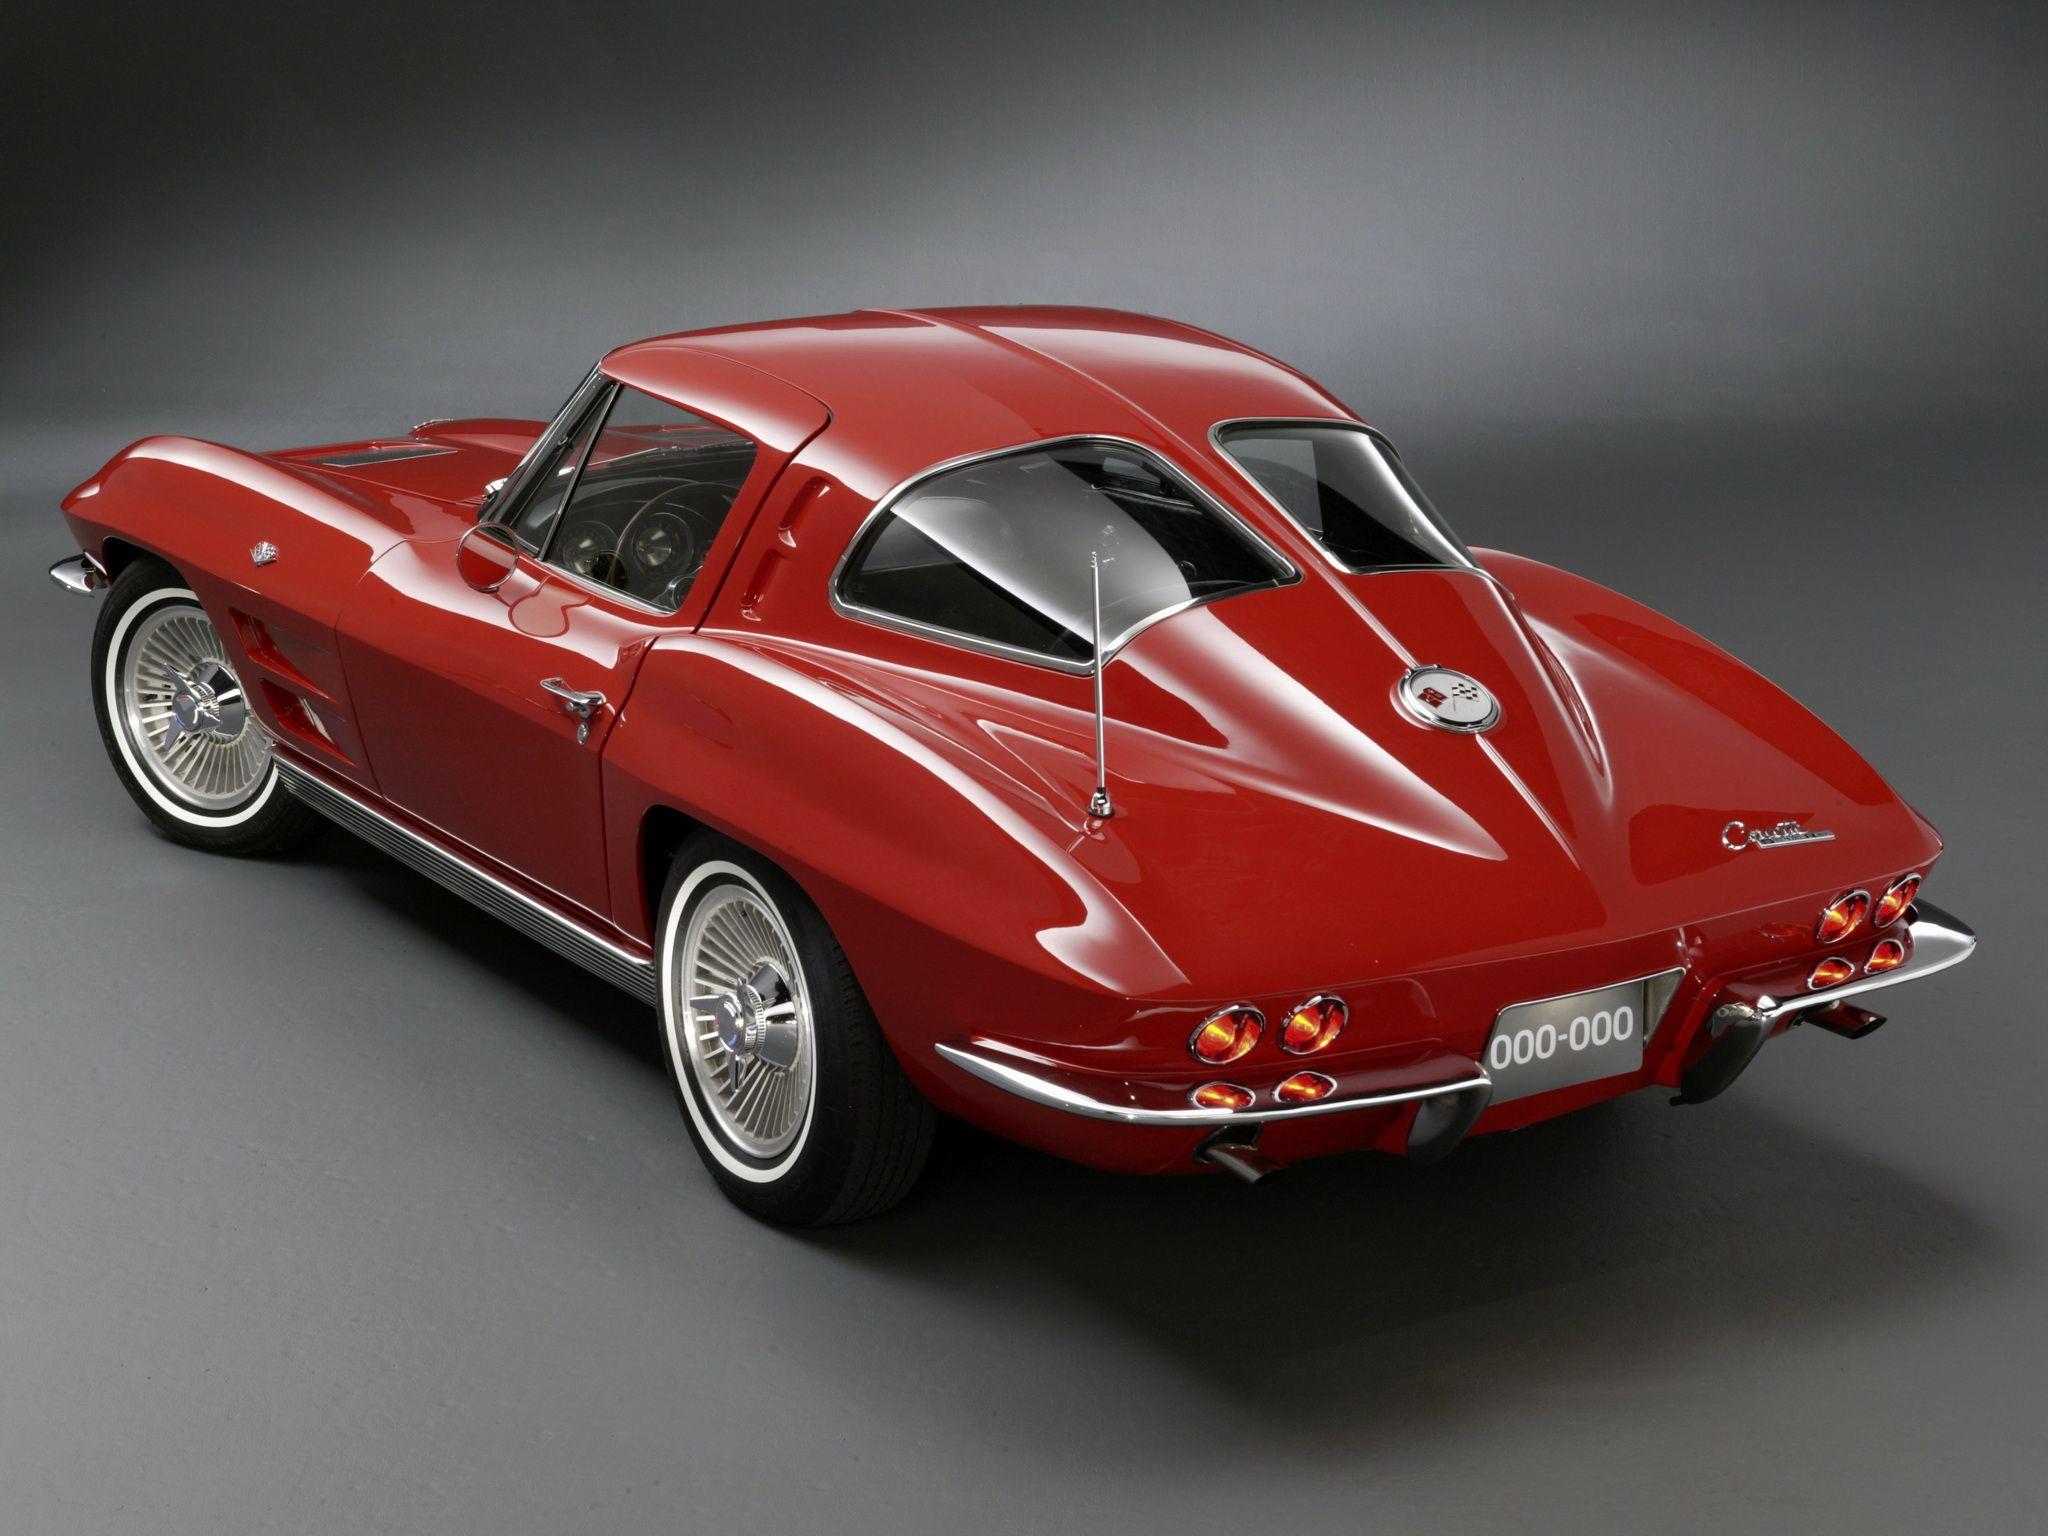 1963 chevrolet corvette c2 stingray the horseless carriage pinterest corvette cars and. Black Bedroom Furniture Sets. Home Design Ideas